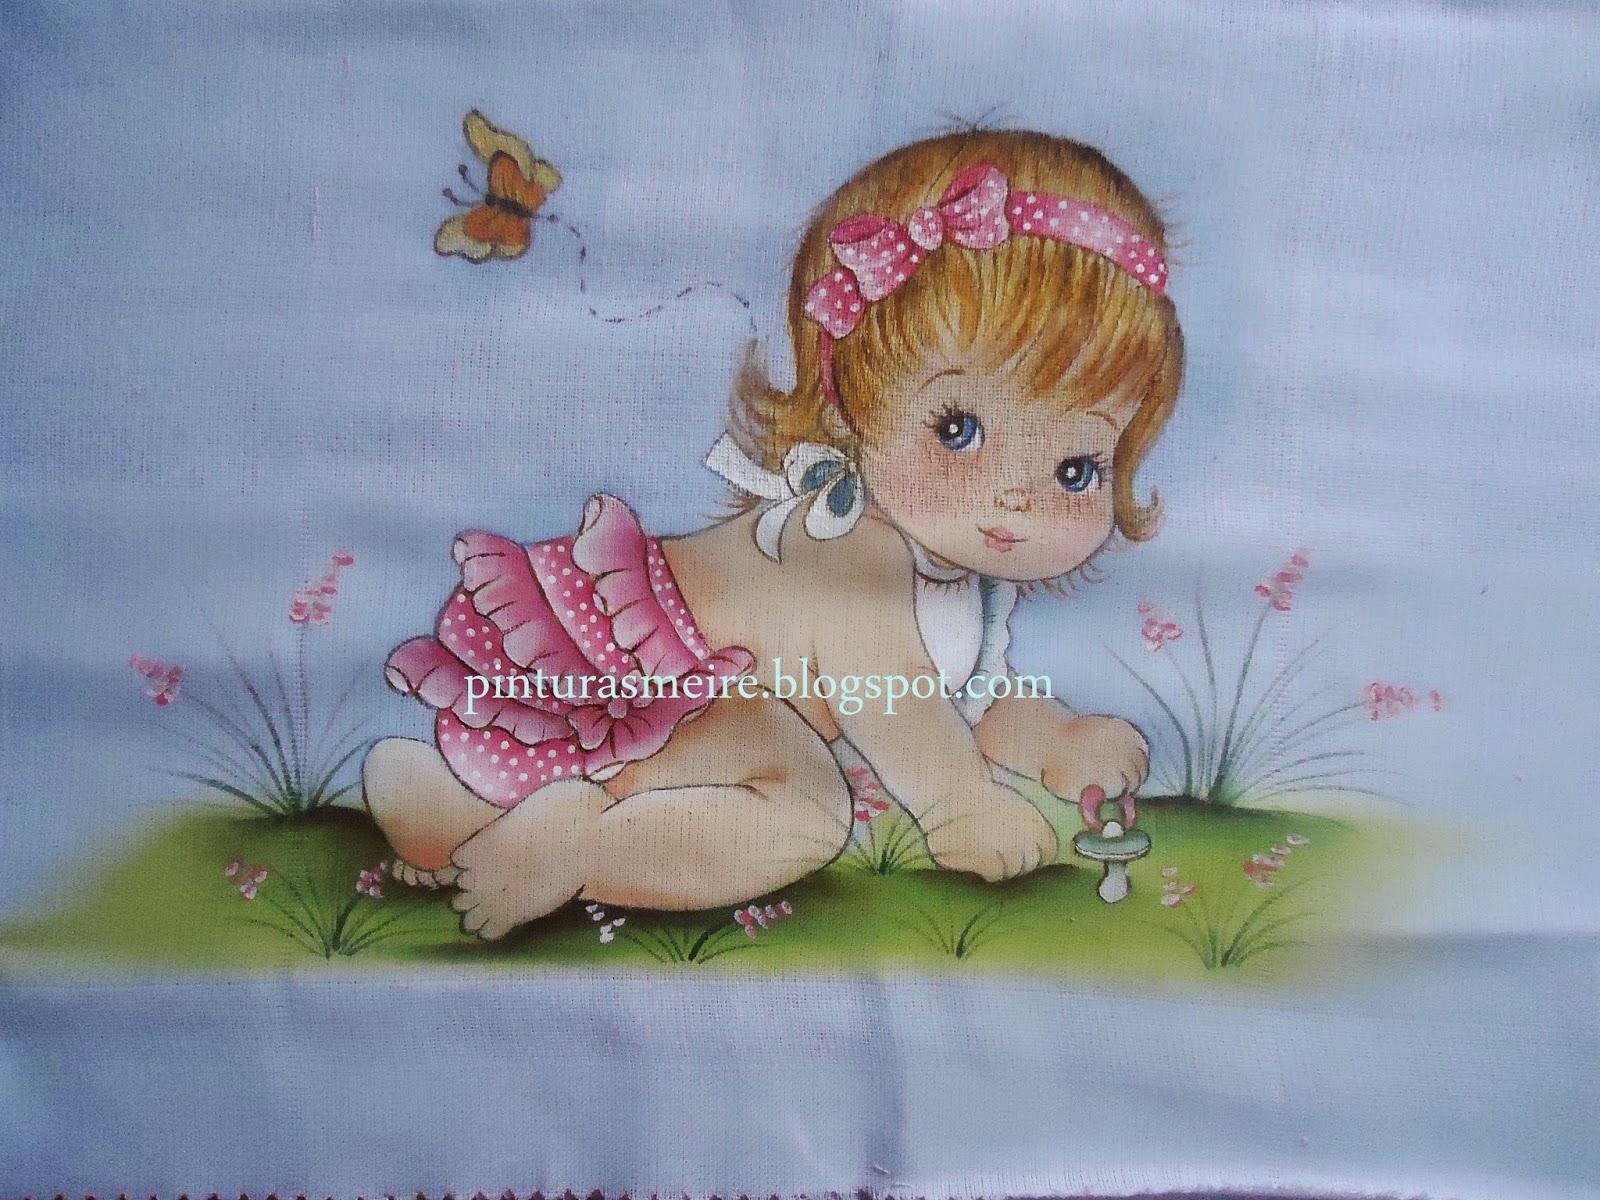 Populares PINTURAS MEIRE: fraldas pintadas UQ78